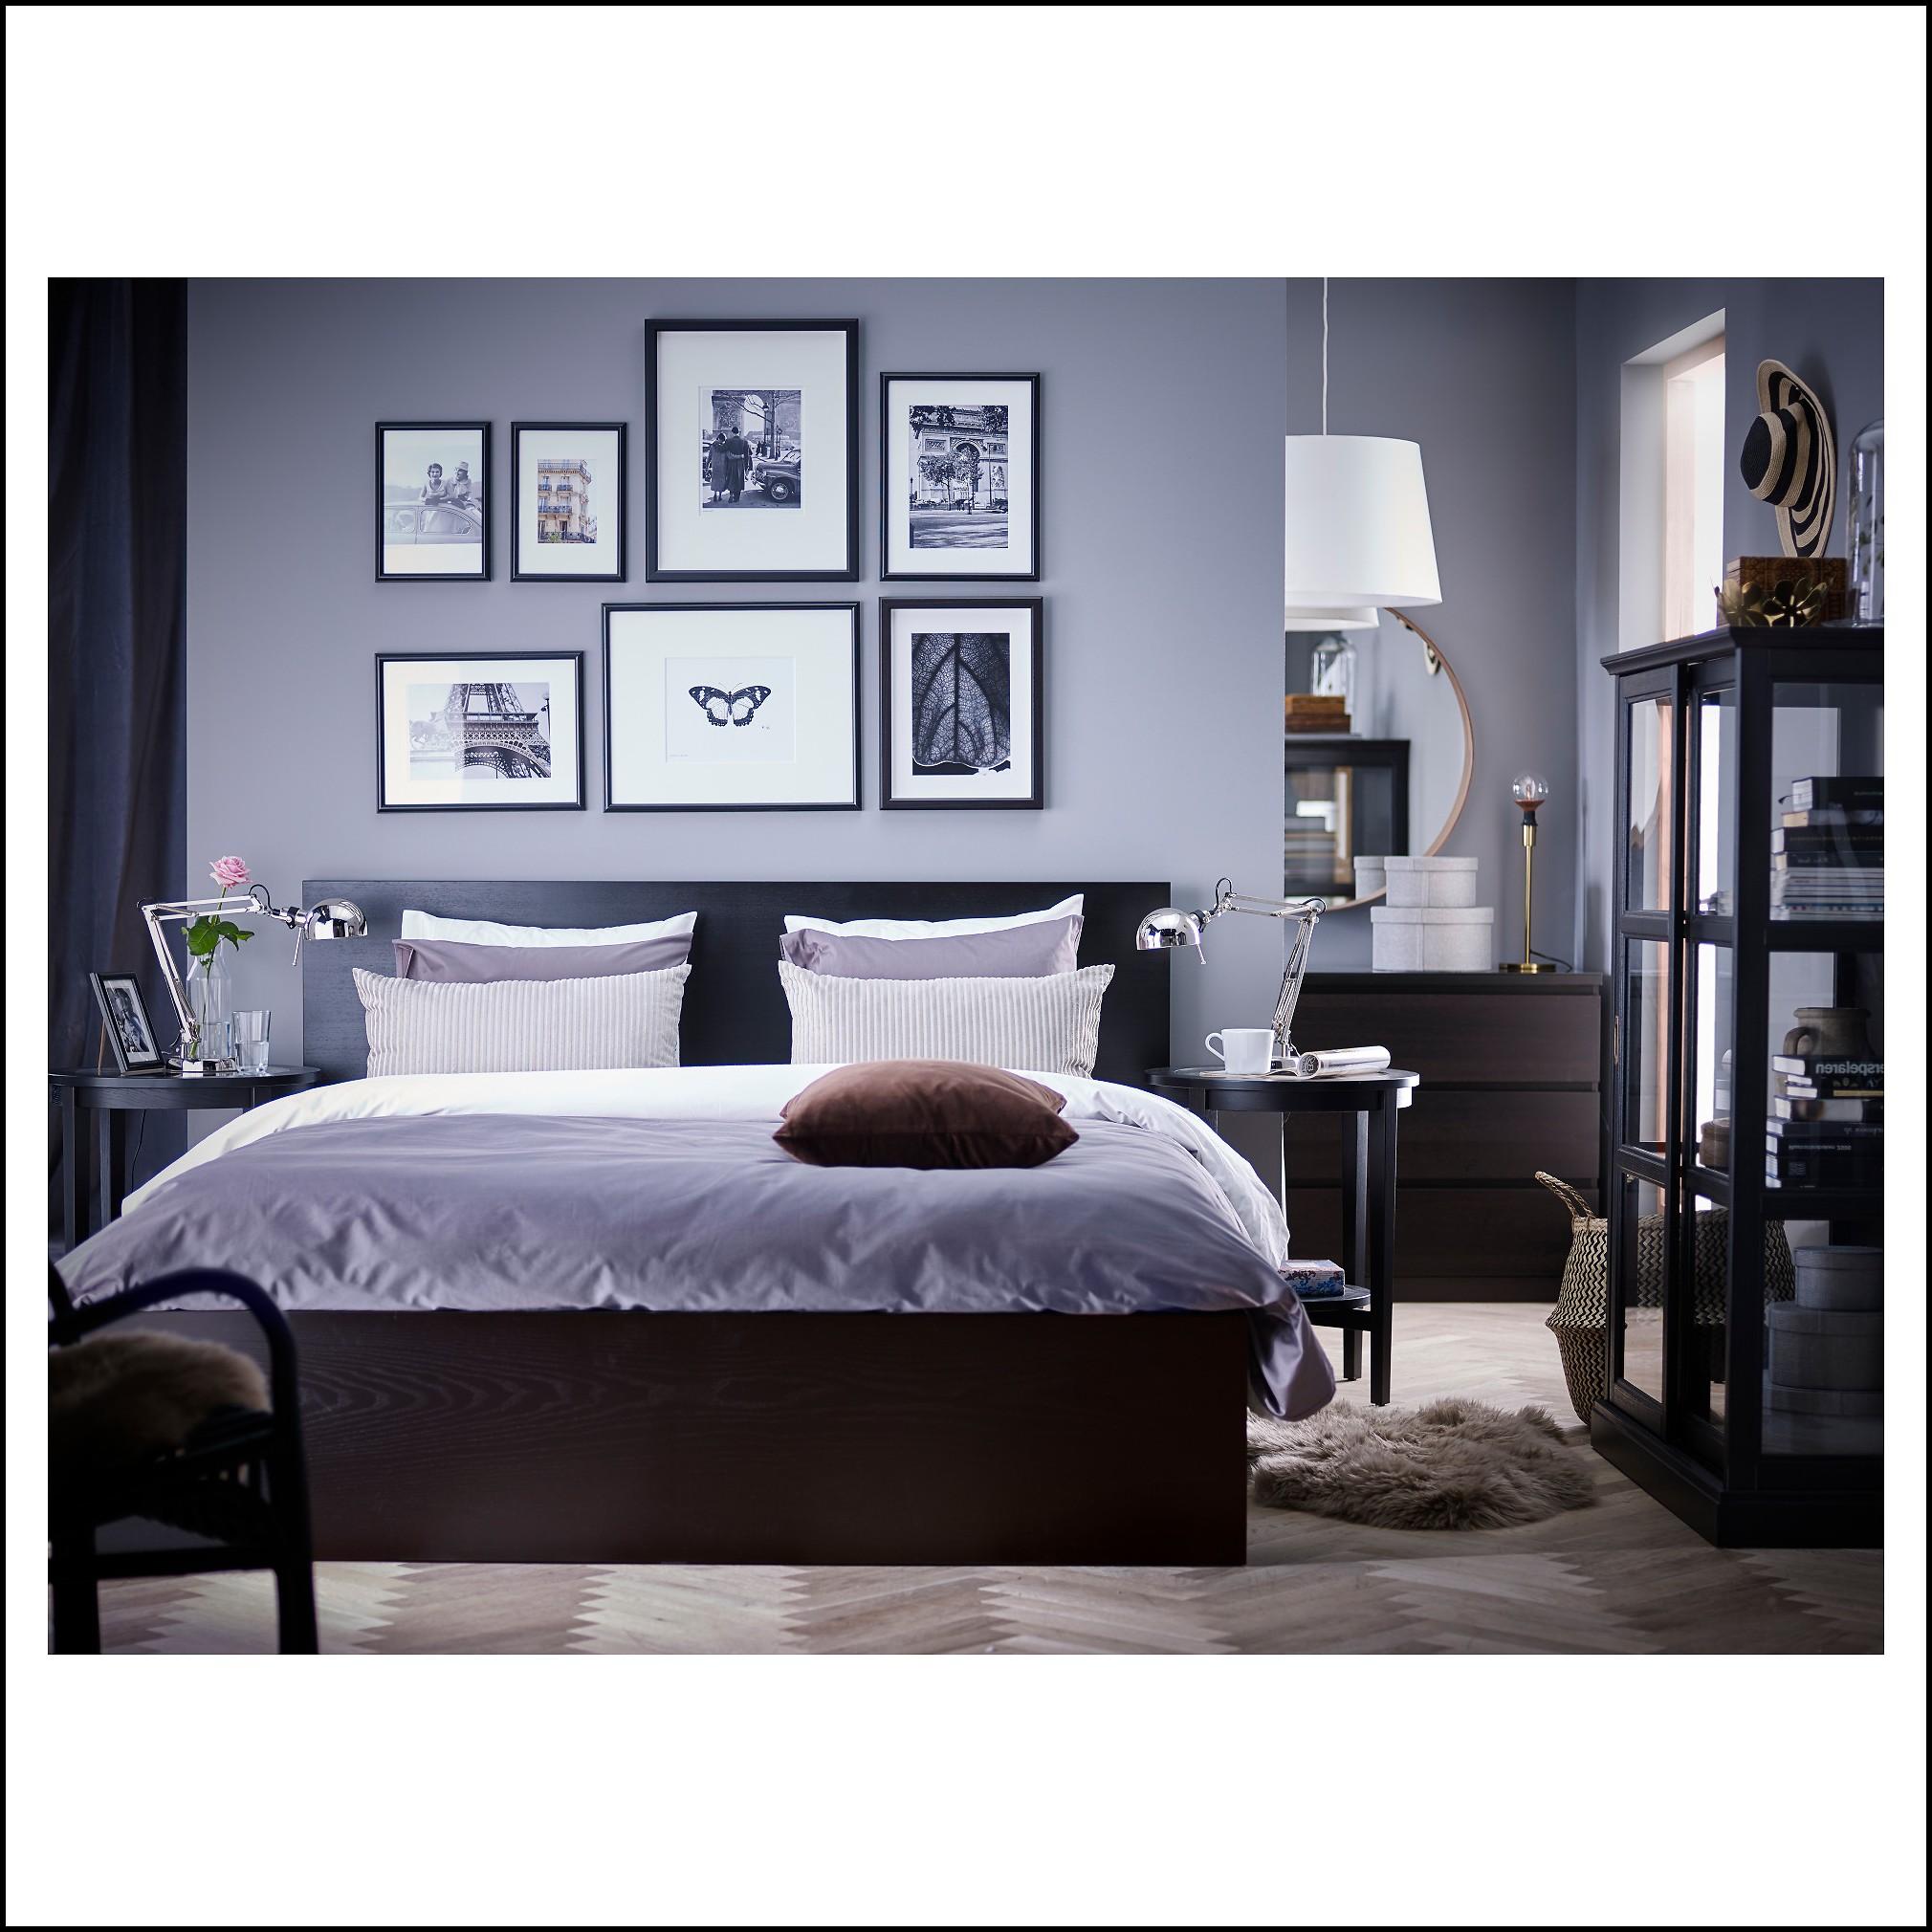 ikea malm bett 140x200 lattenrost betten house und dekor galerie elkgkmmka7. Black Bedroom Furniture Sets. Home Design Ideas